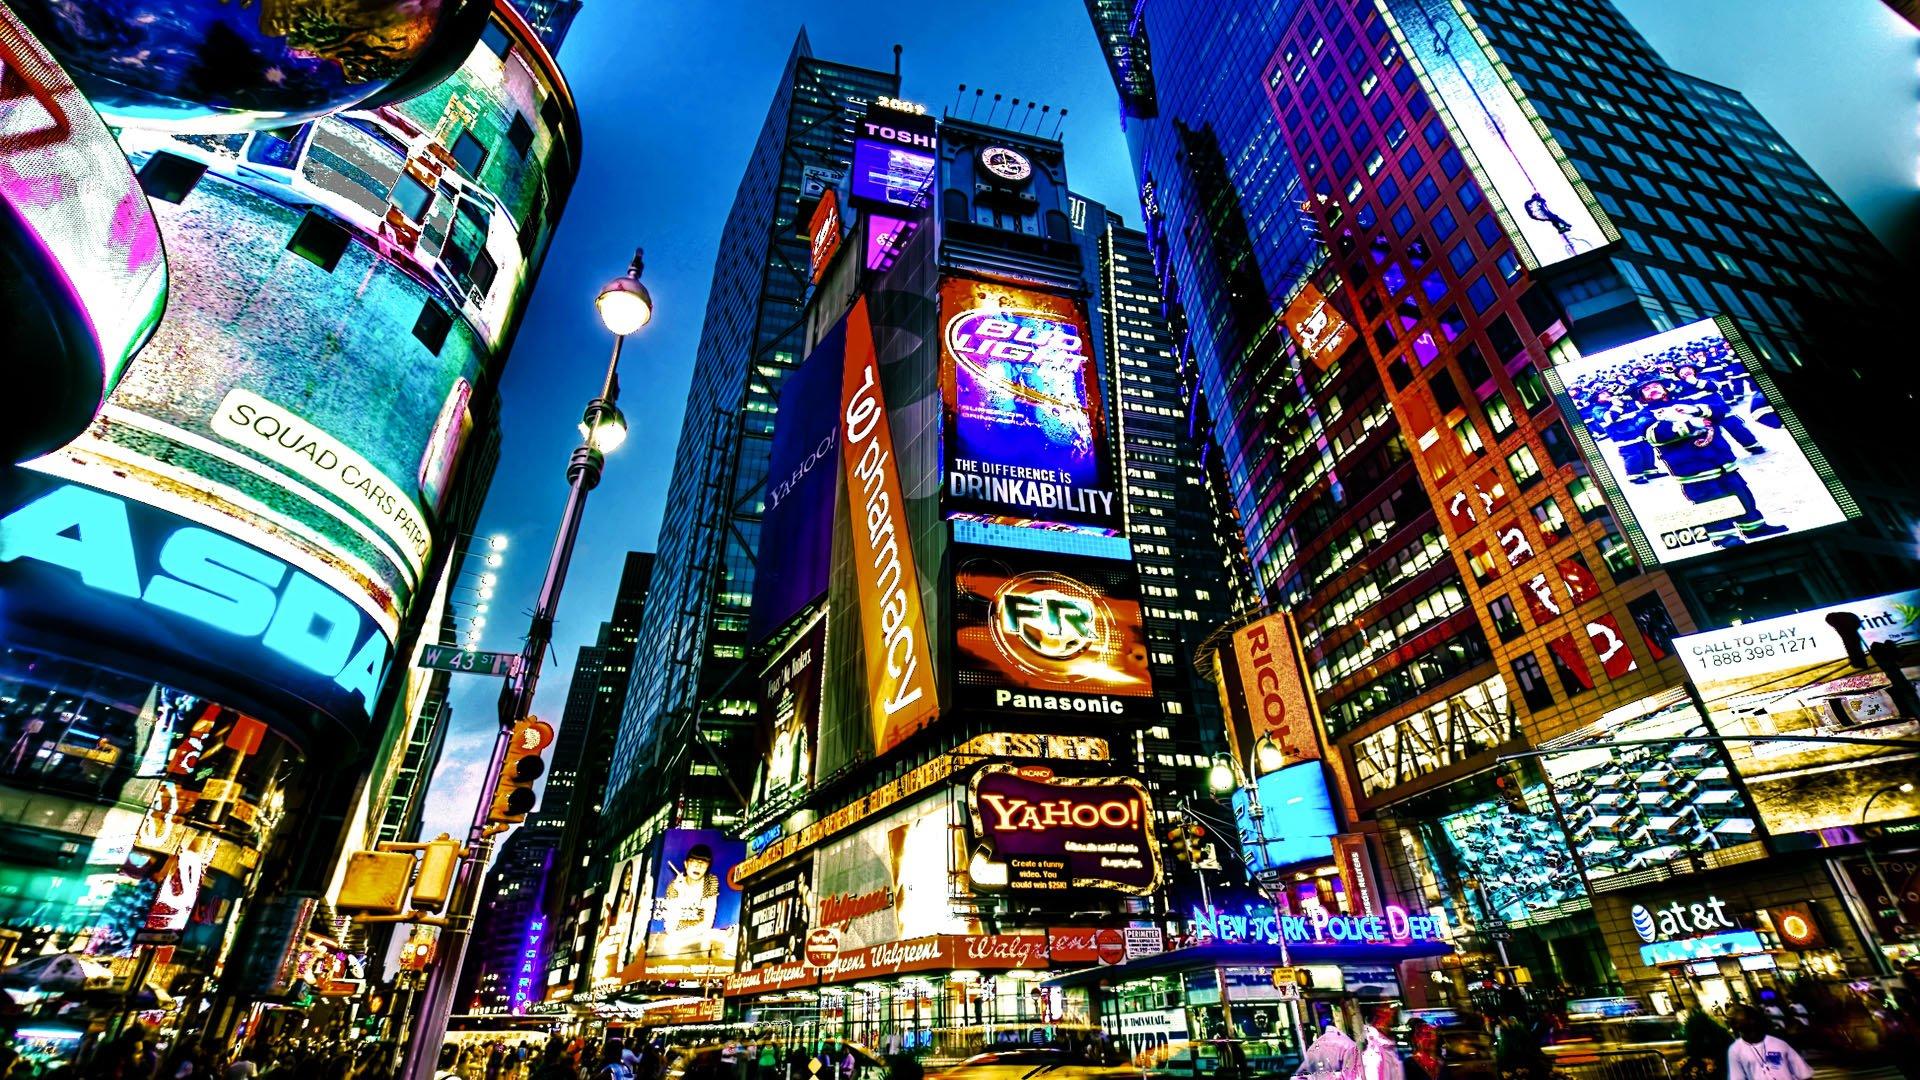 New York City Desktop Wallpaper 1920x1080